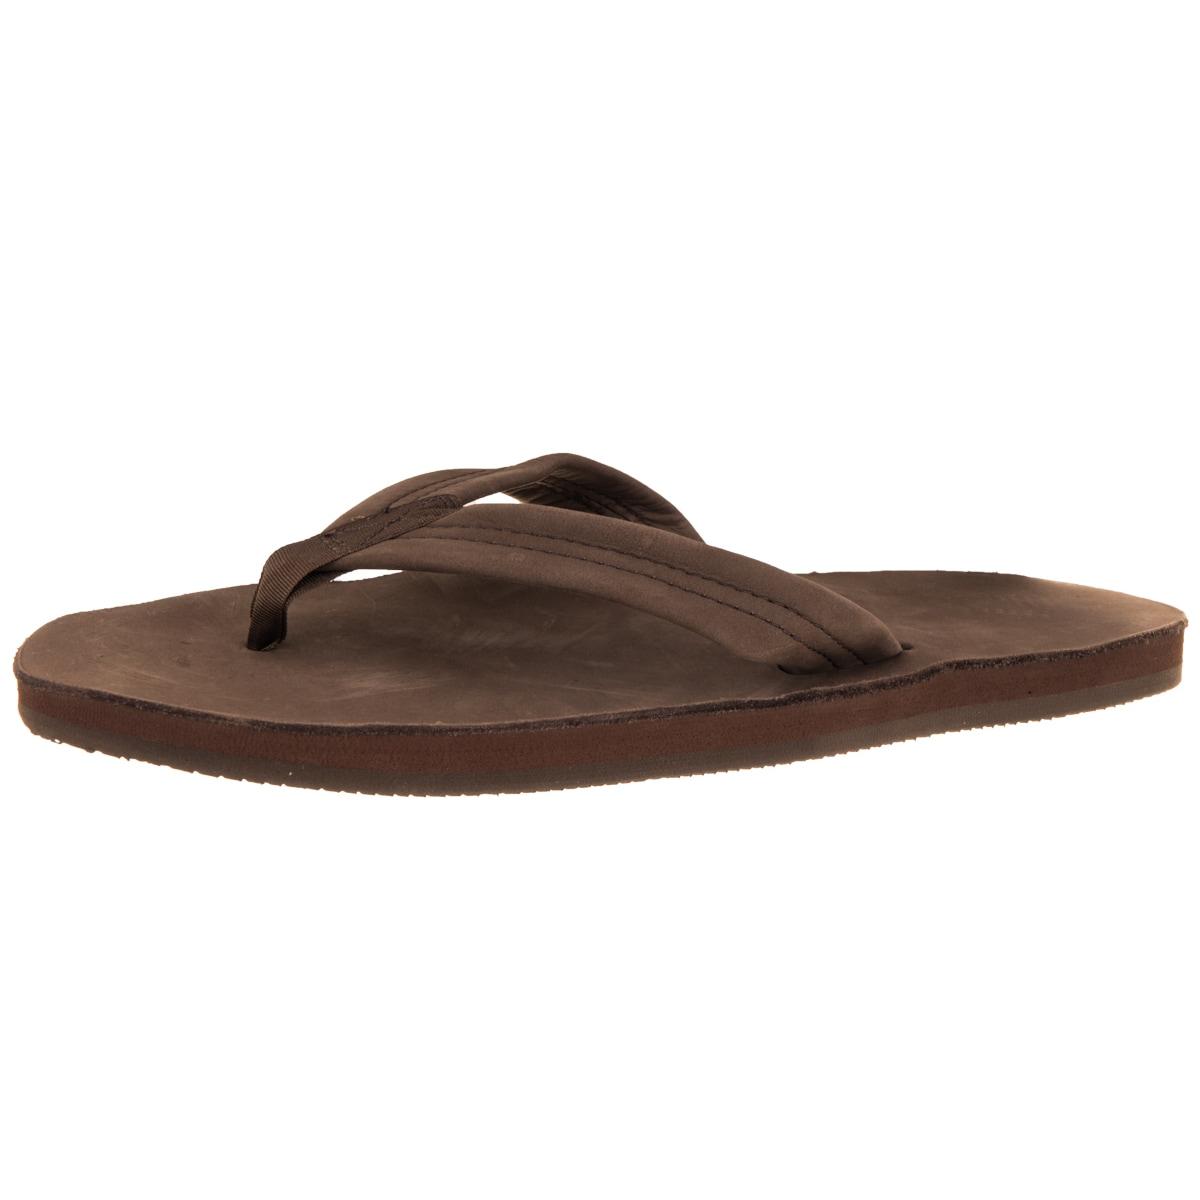 Rainbow Sandals Men's Single Layer Premier Expresso Sanda...